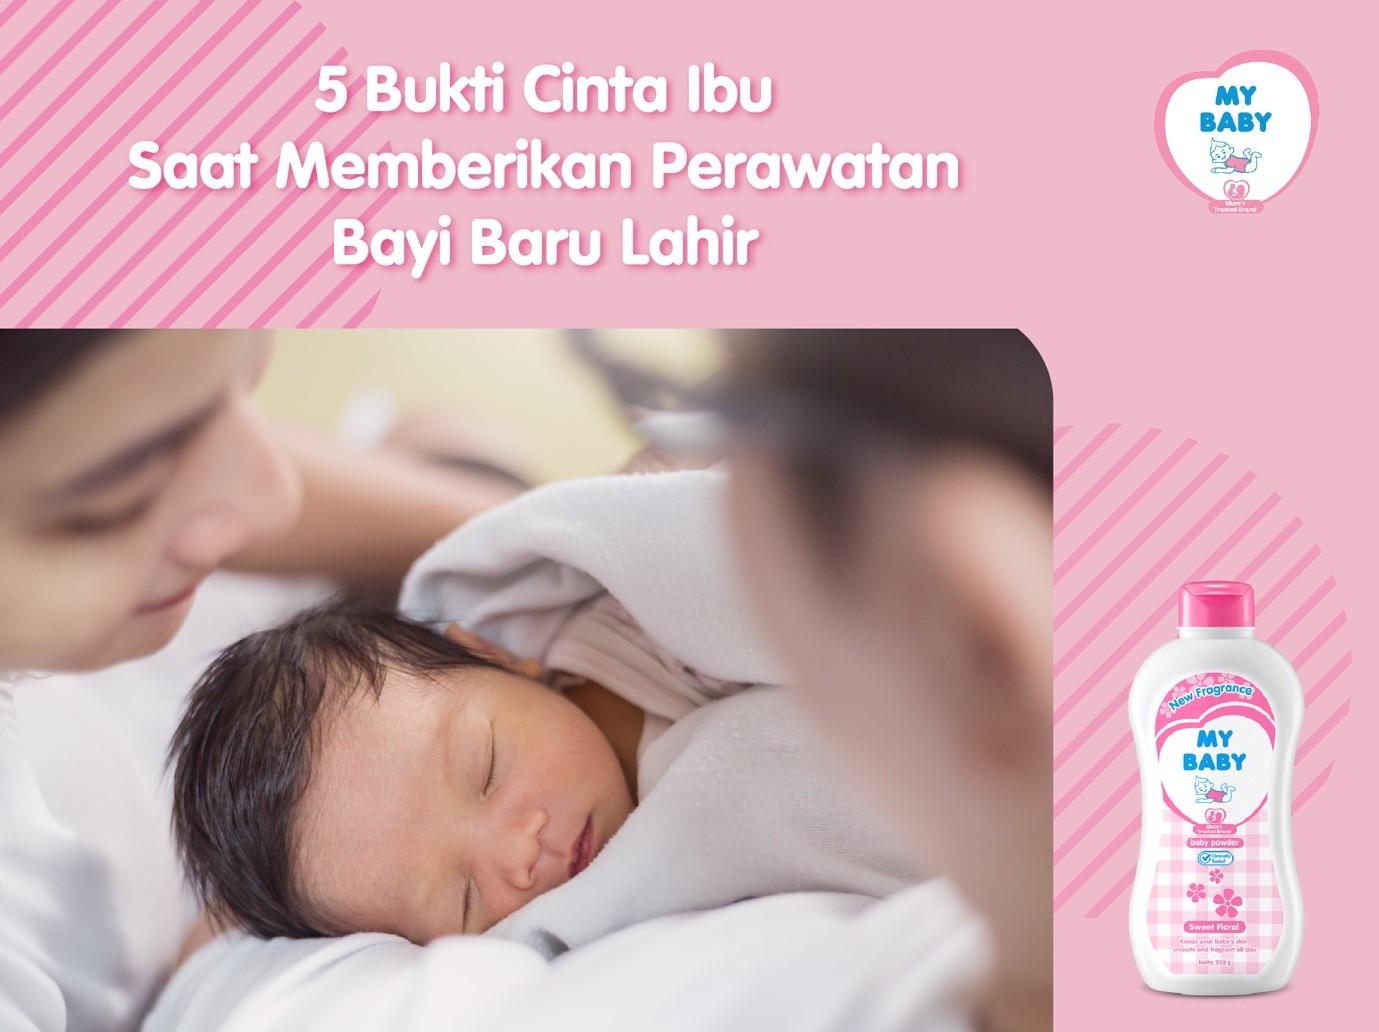 5 Bukti Cinta Ibu Dalam Memberikan Perawatan Bayi Baru Lahir